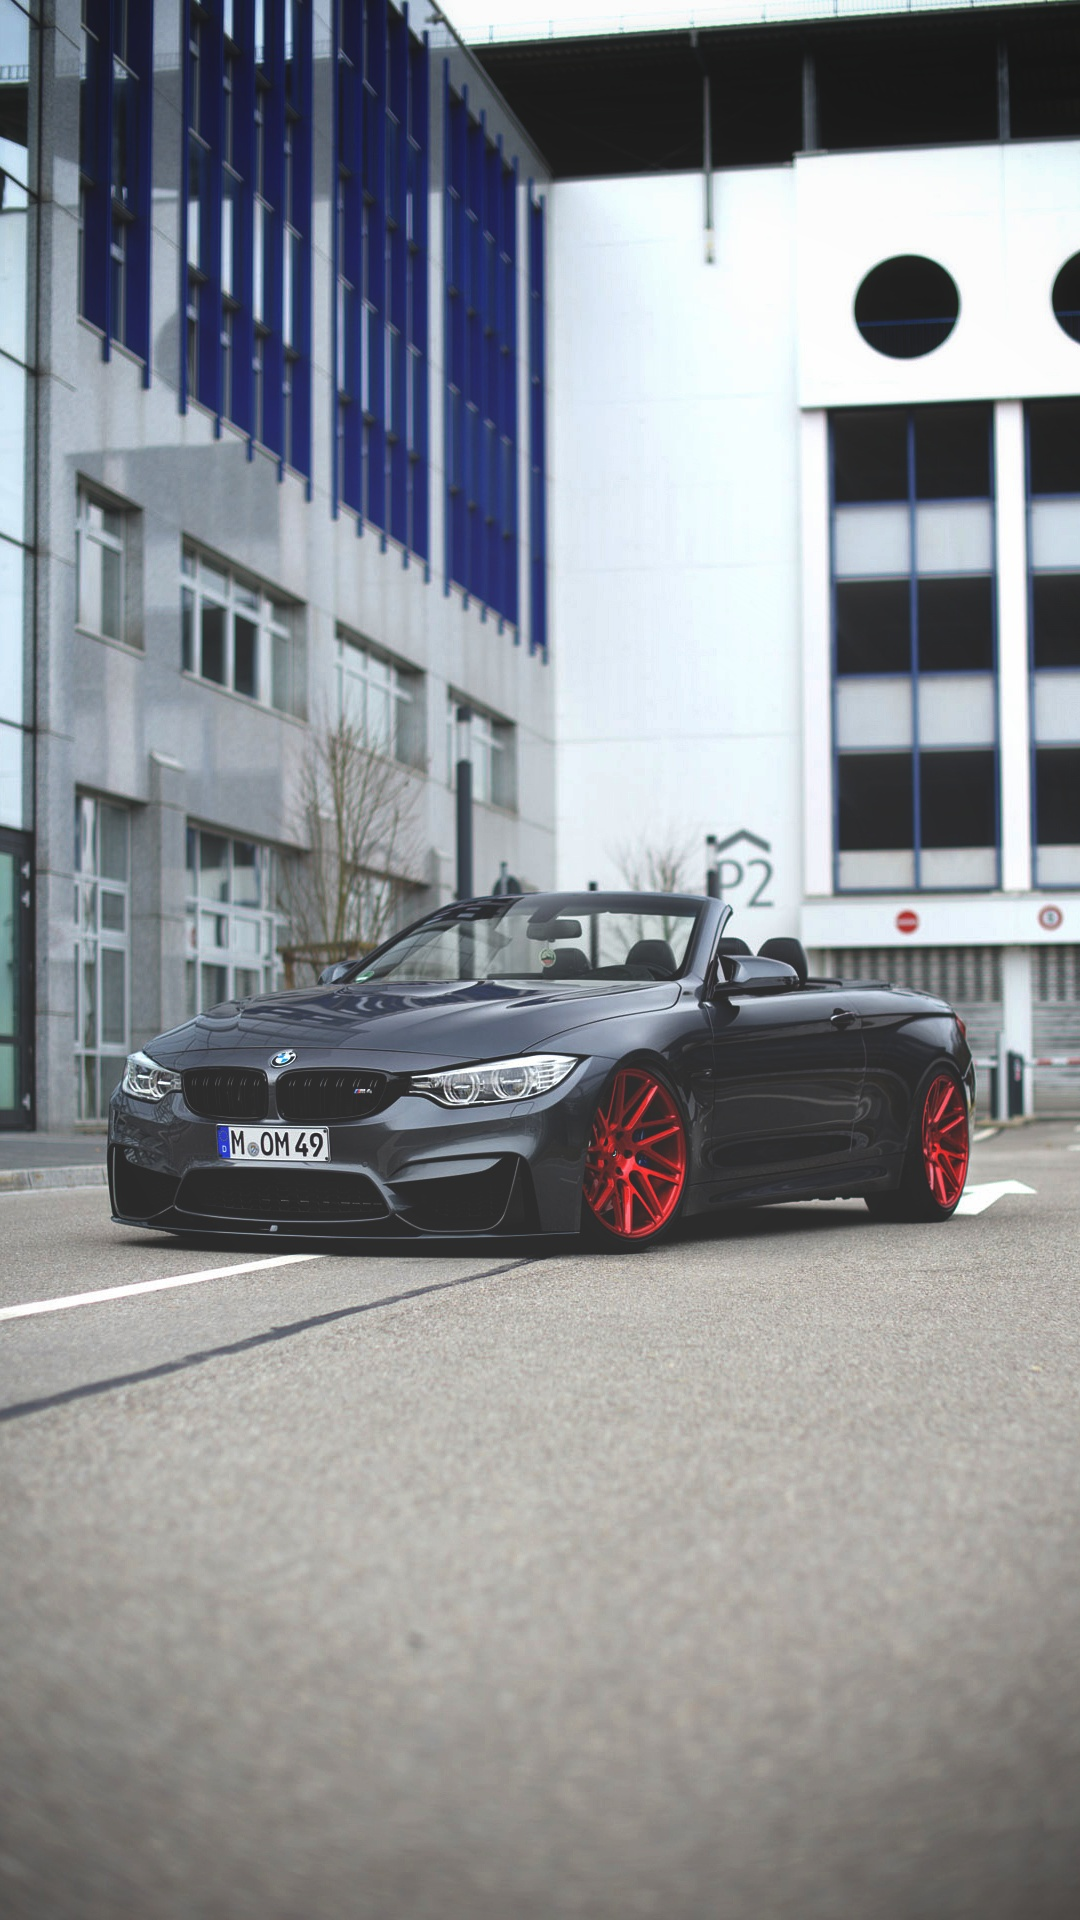 iPhone wallpaper bmw m4 BMW